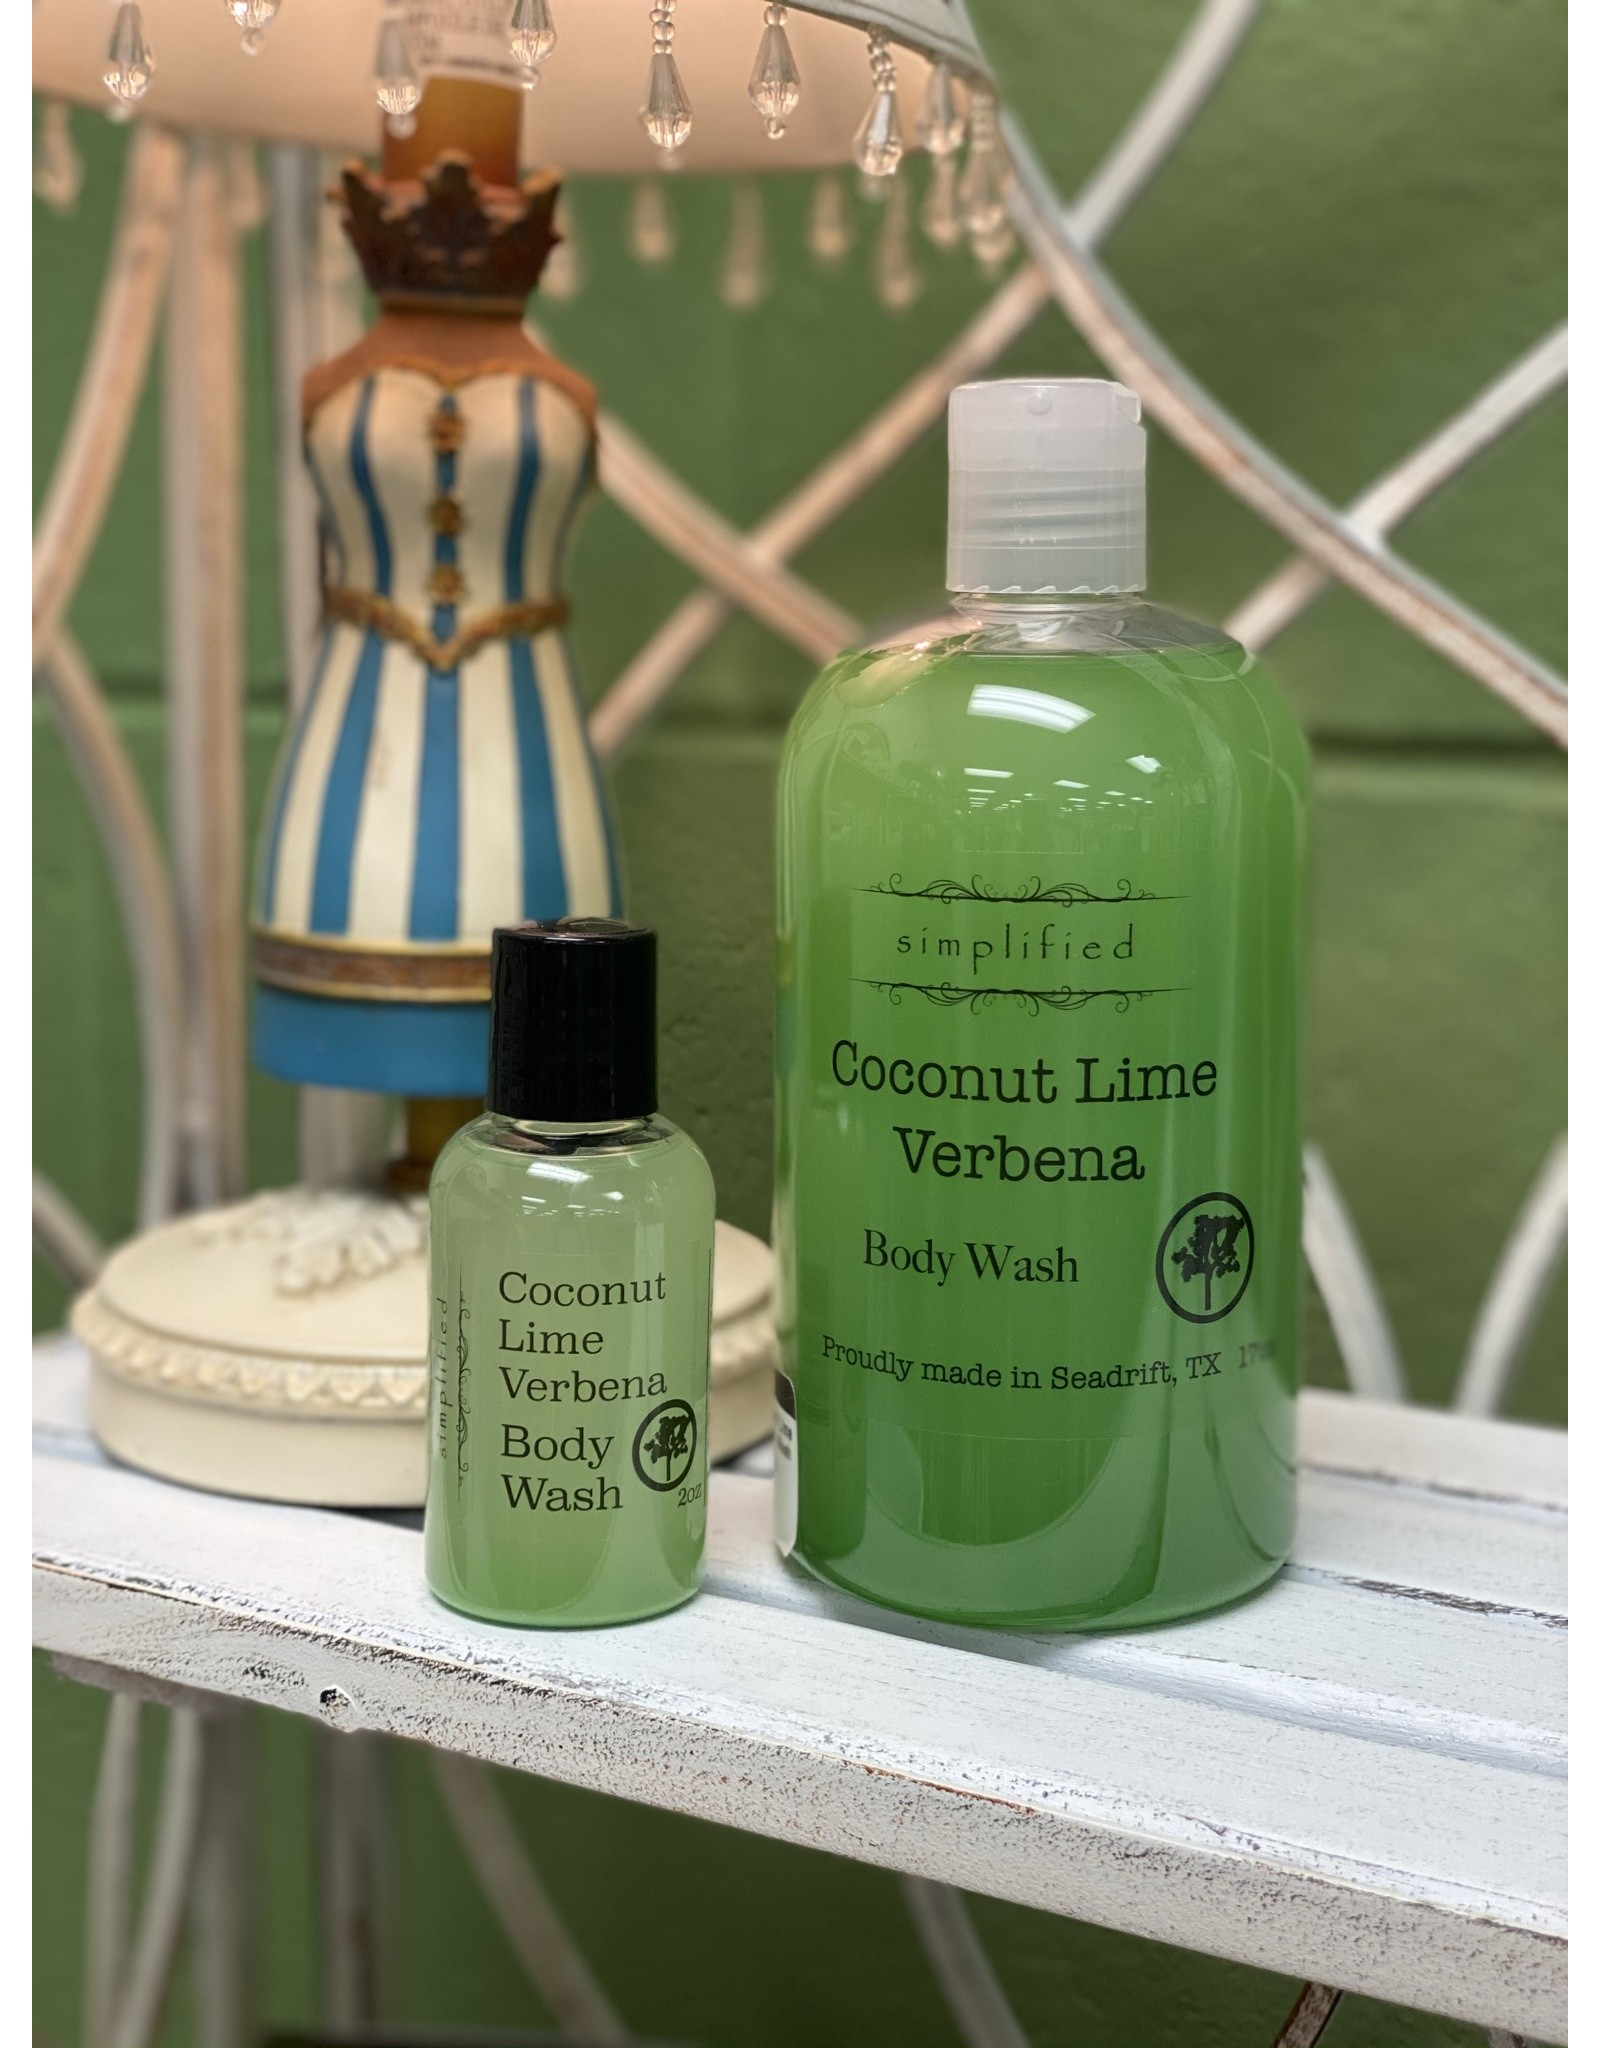 Coconut Lime Verbena Body Wash 2oz